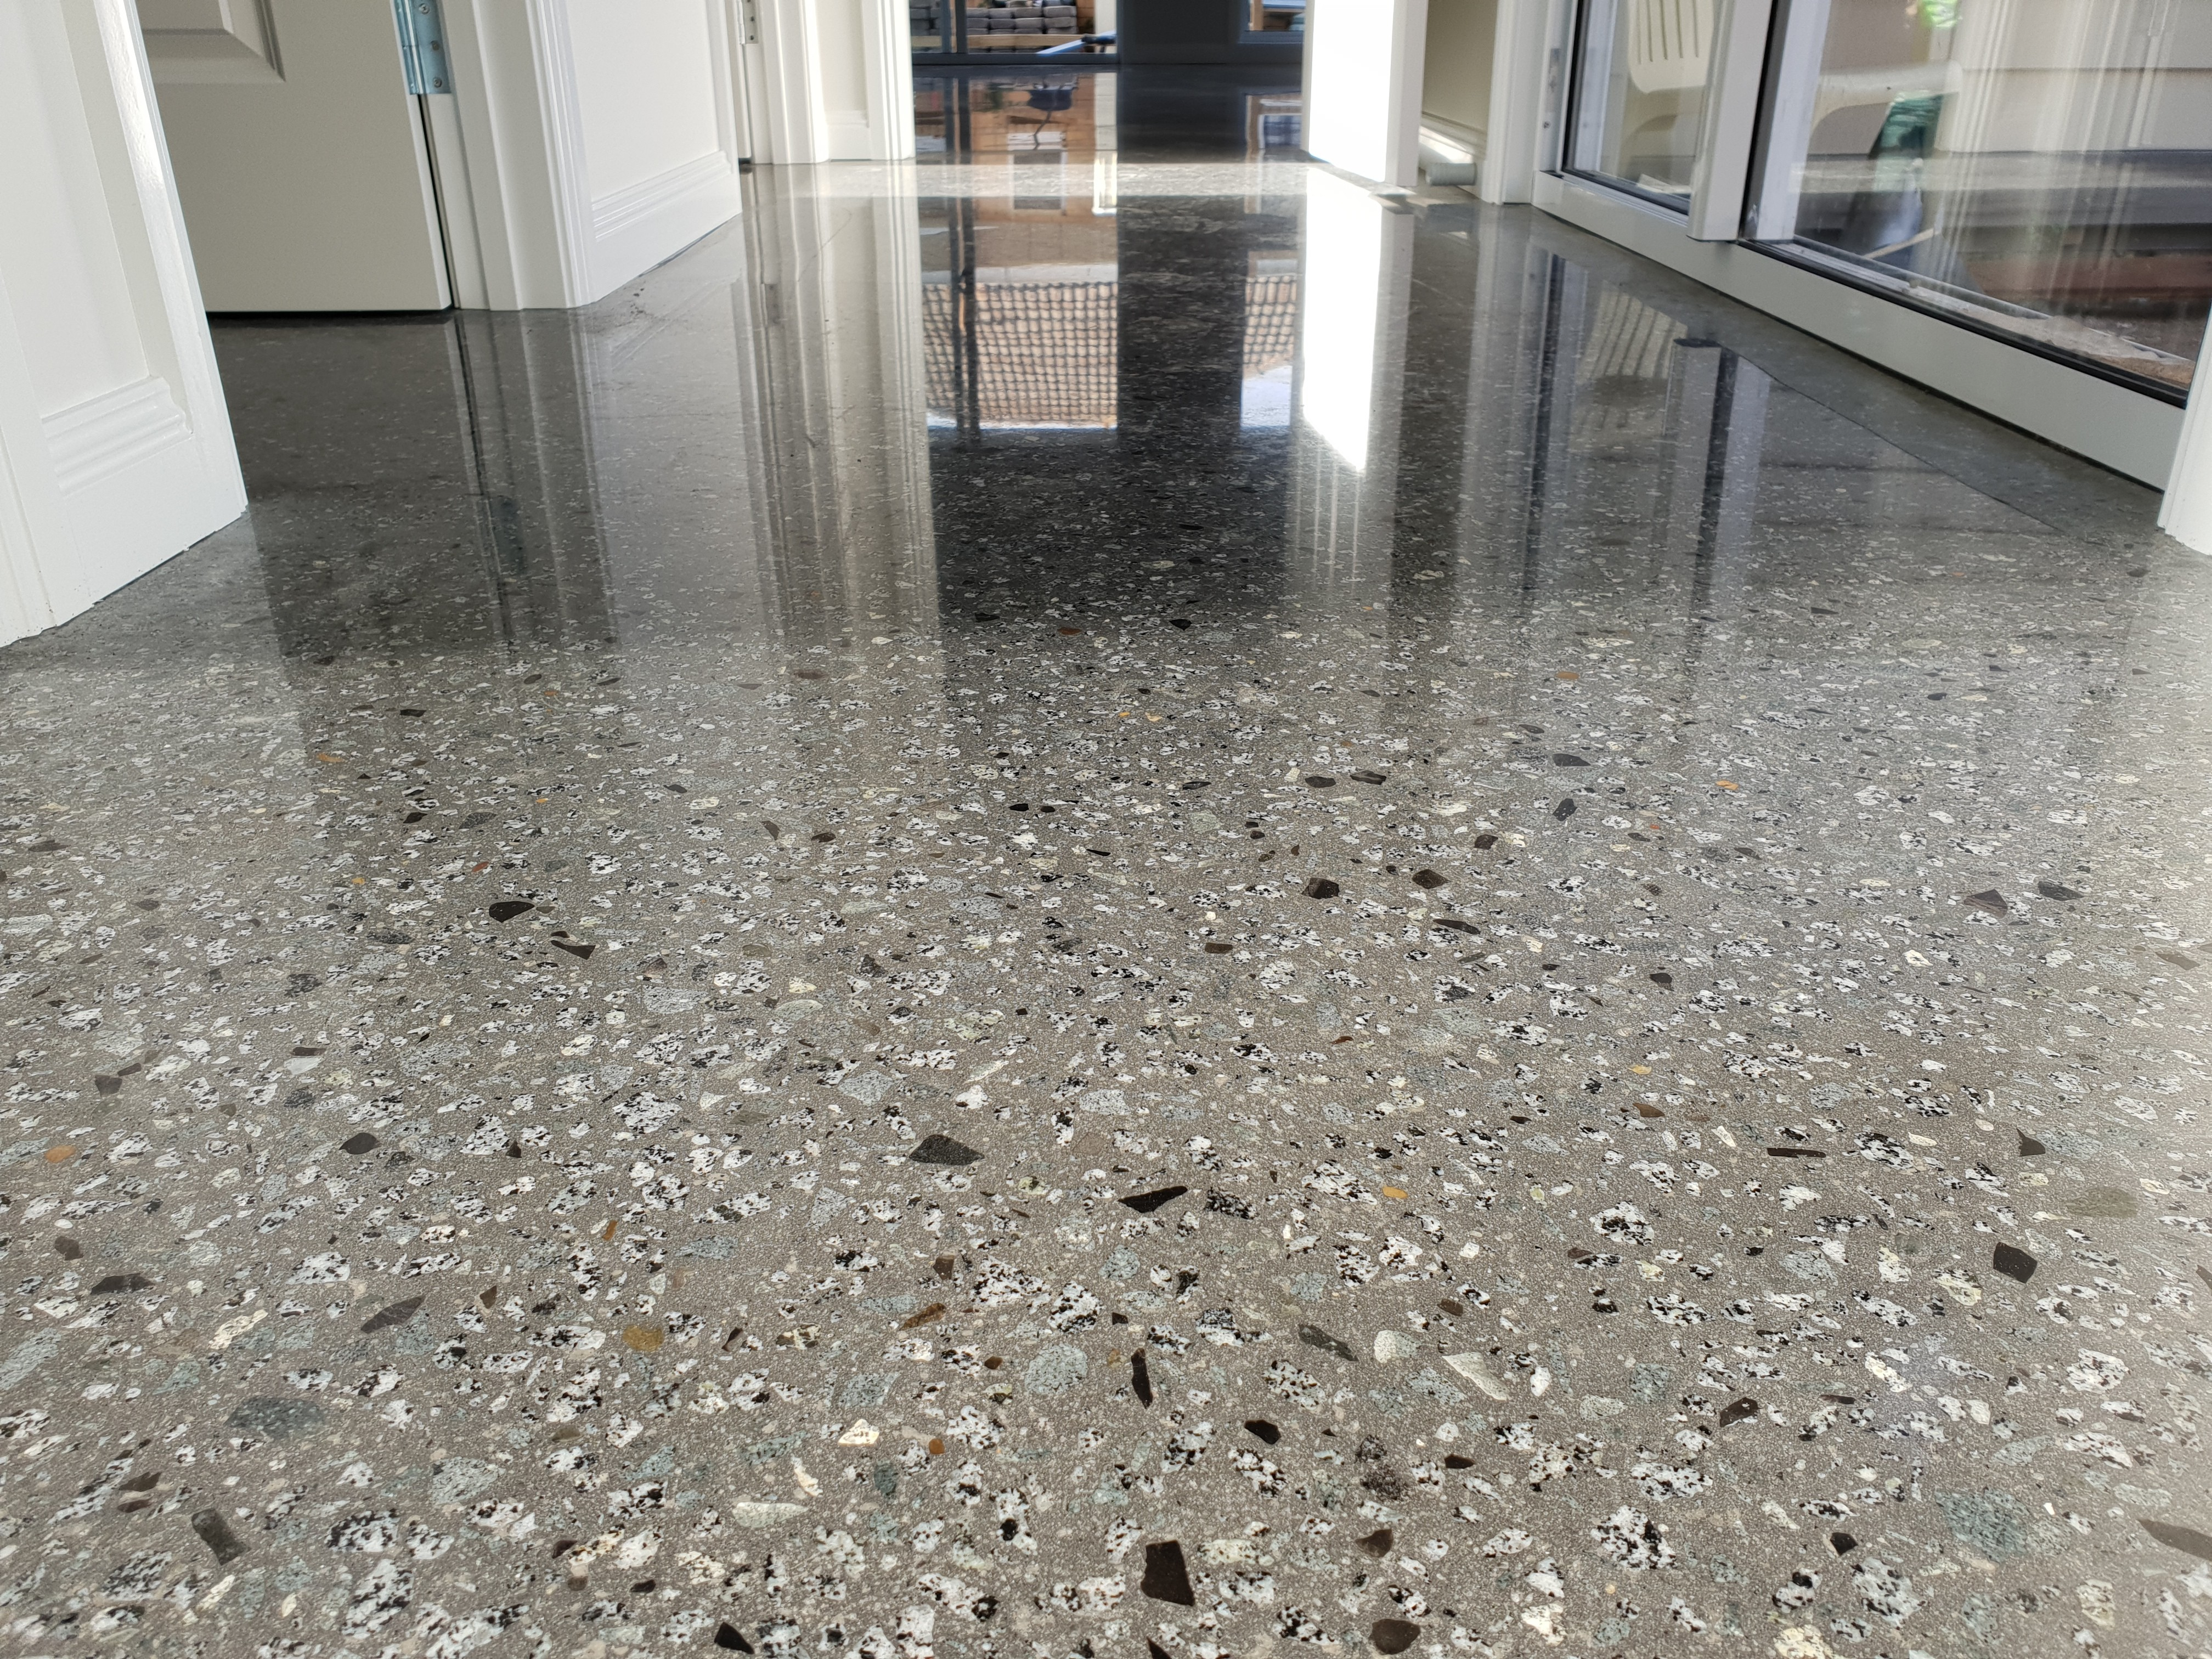 GALAXY Concrete Polishing & Grinding | LinkedIn